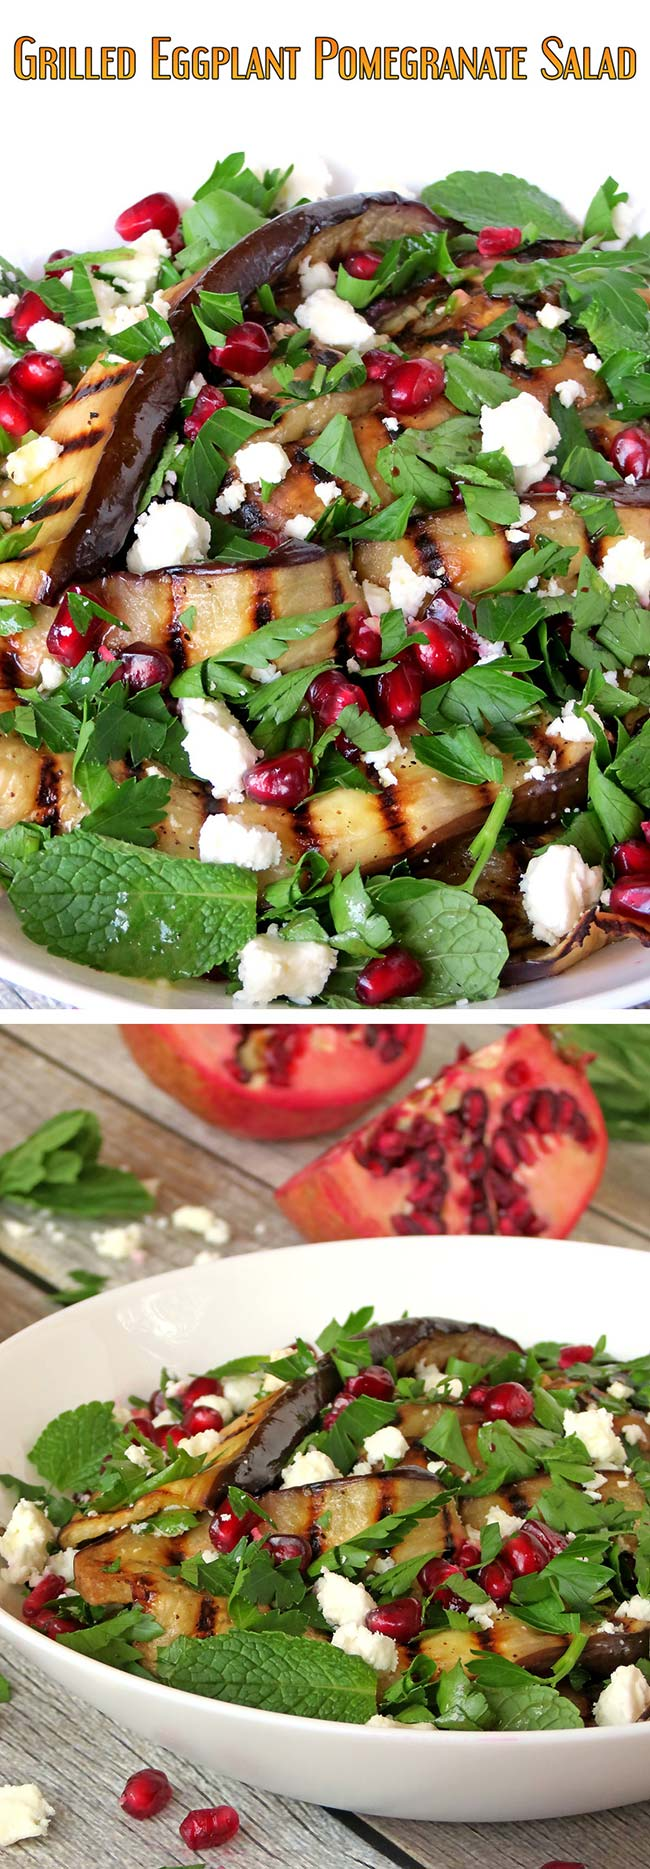 Healthy Grilled Eggplant, Pomegranate And Feta Salad | yummyaddiction ...